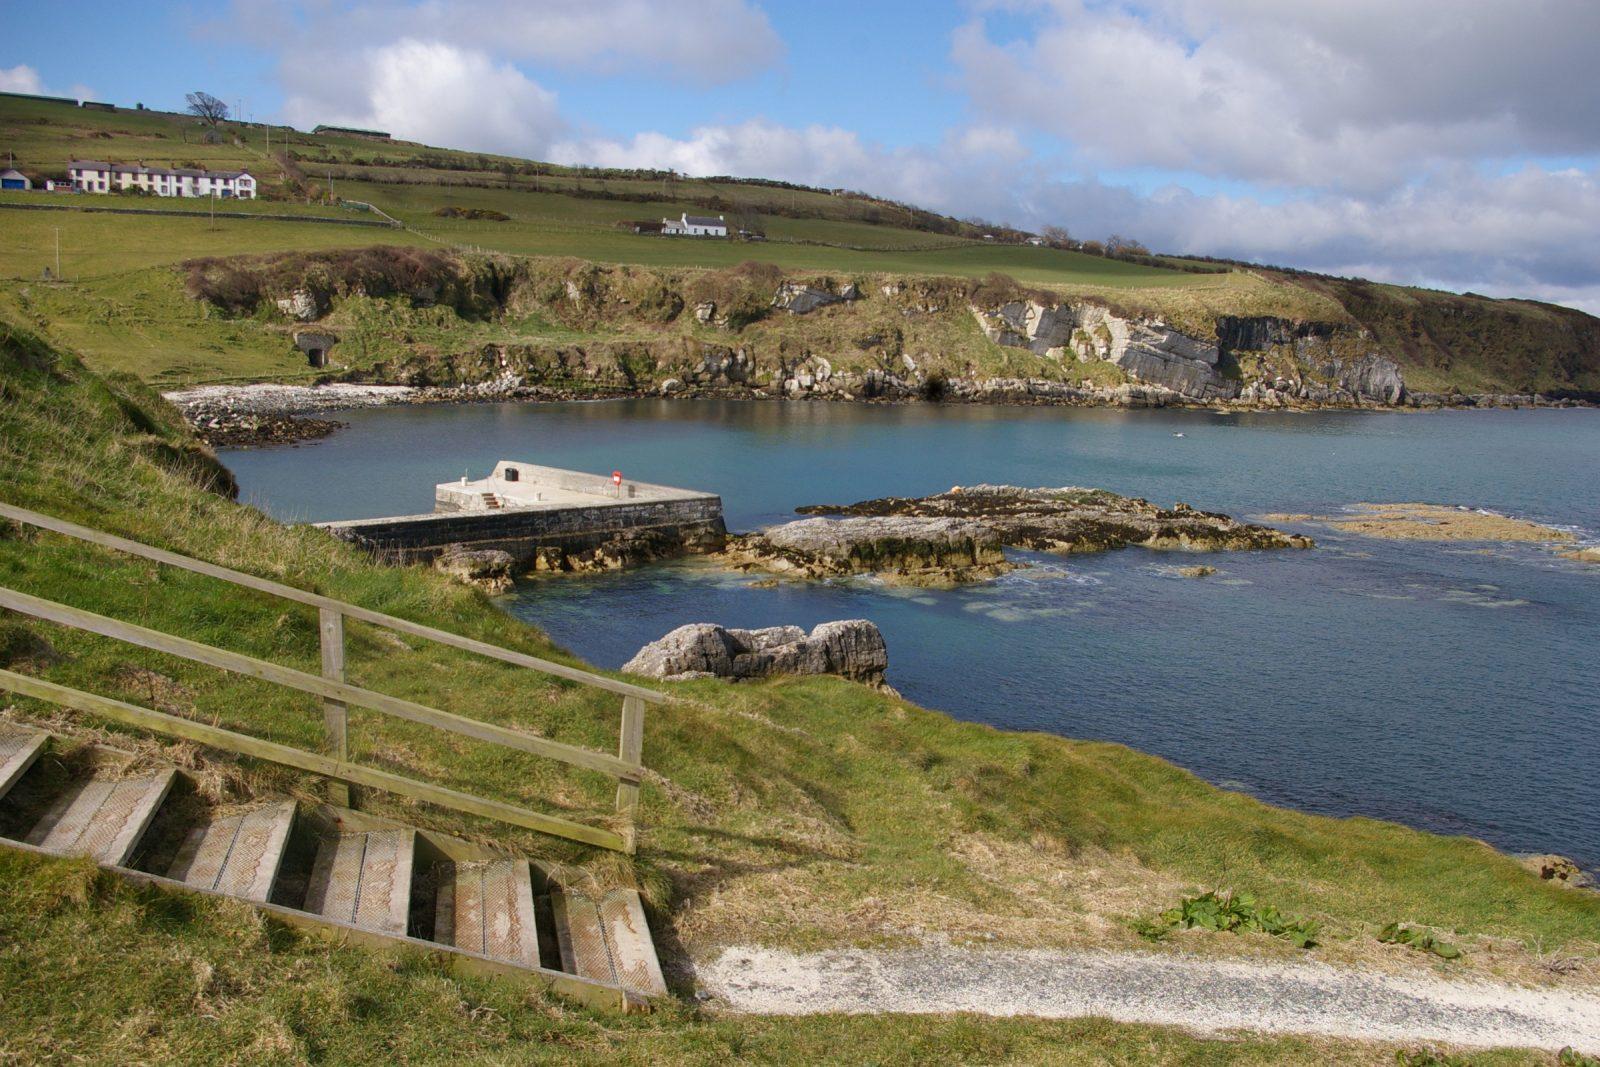 Islandmagee Causeway Coastal Route